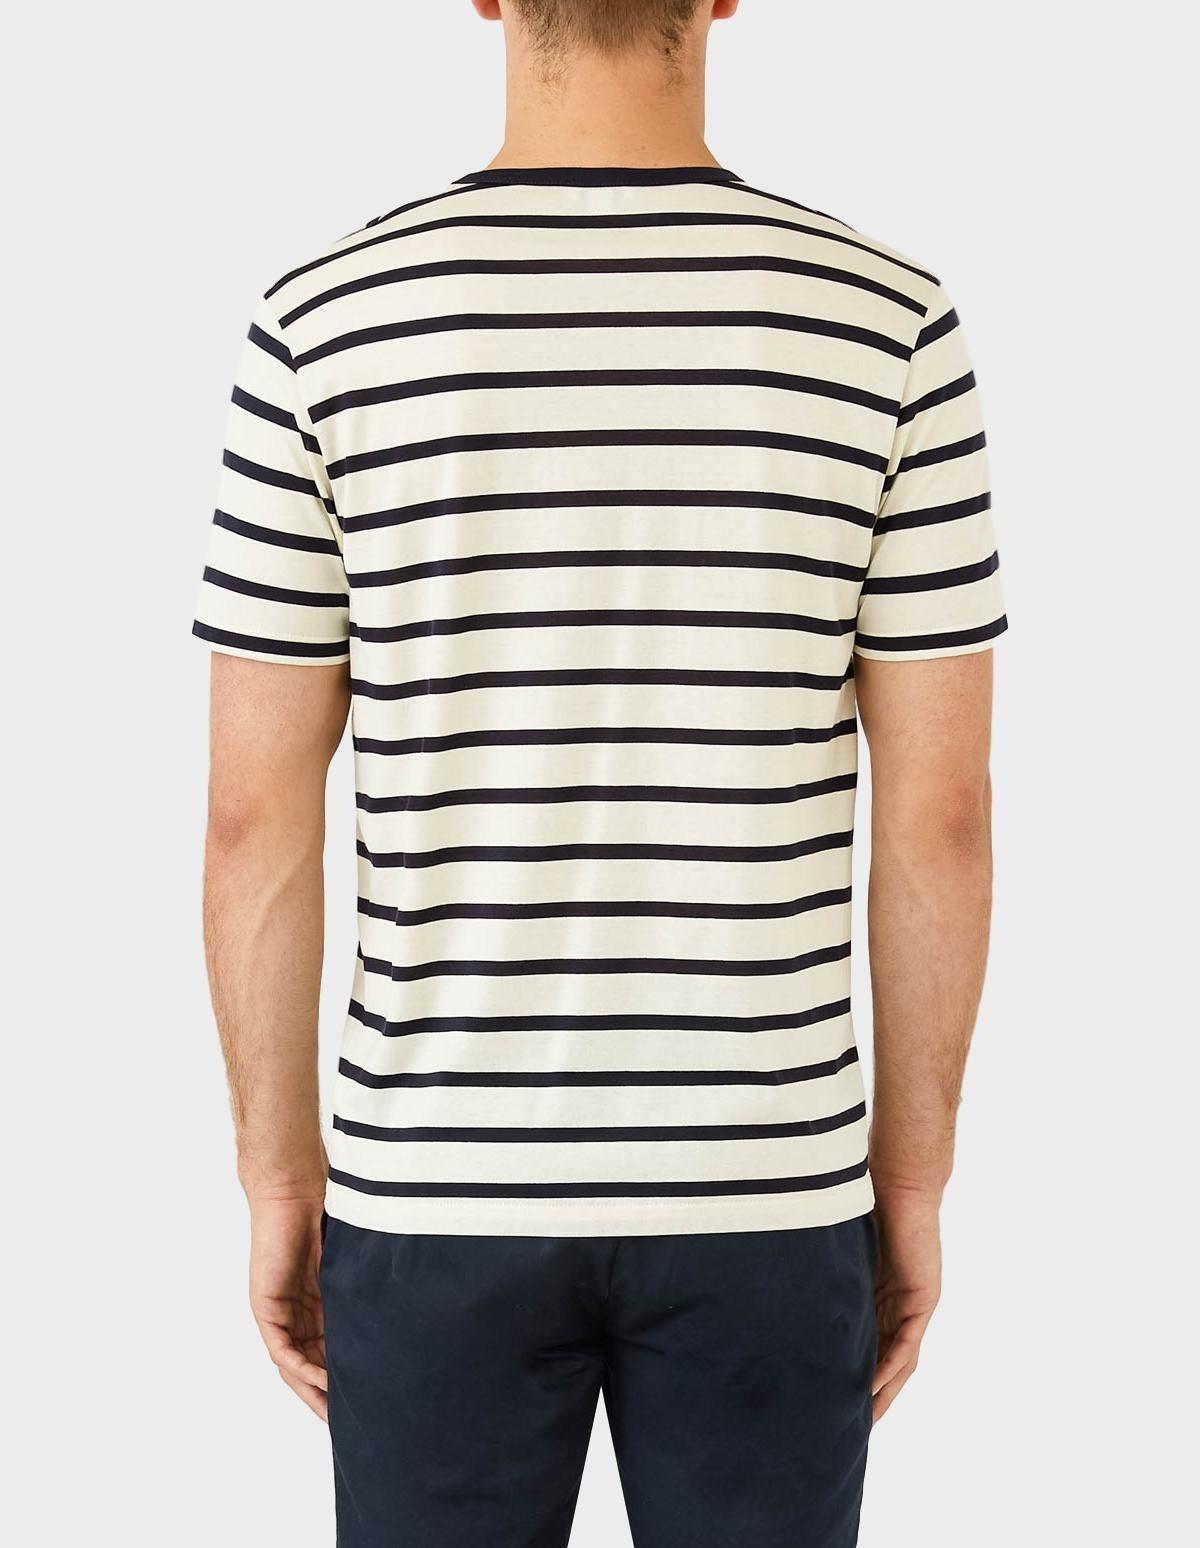 Sunspel Short Sleeve Striped Crew Neck T-Shirt in Ecru / Navy